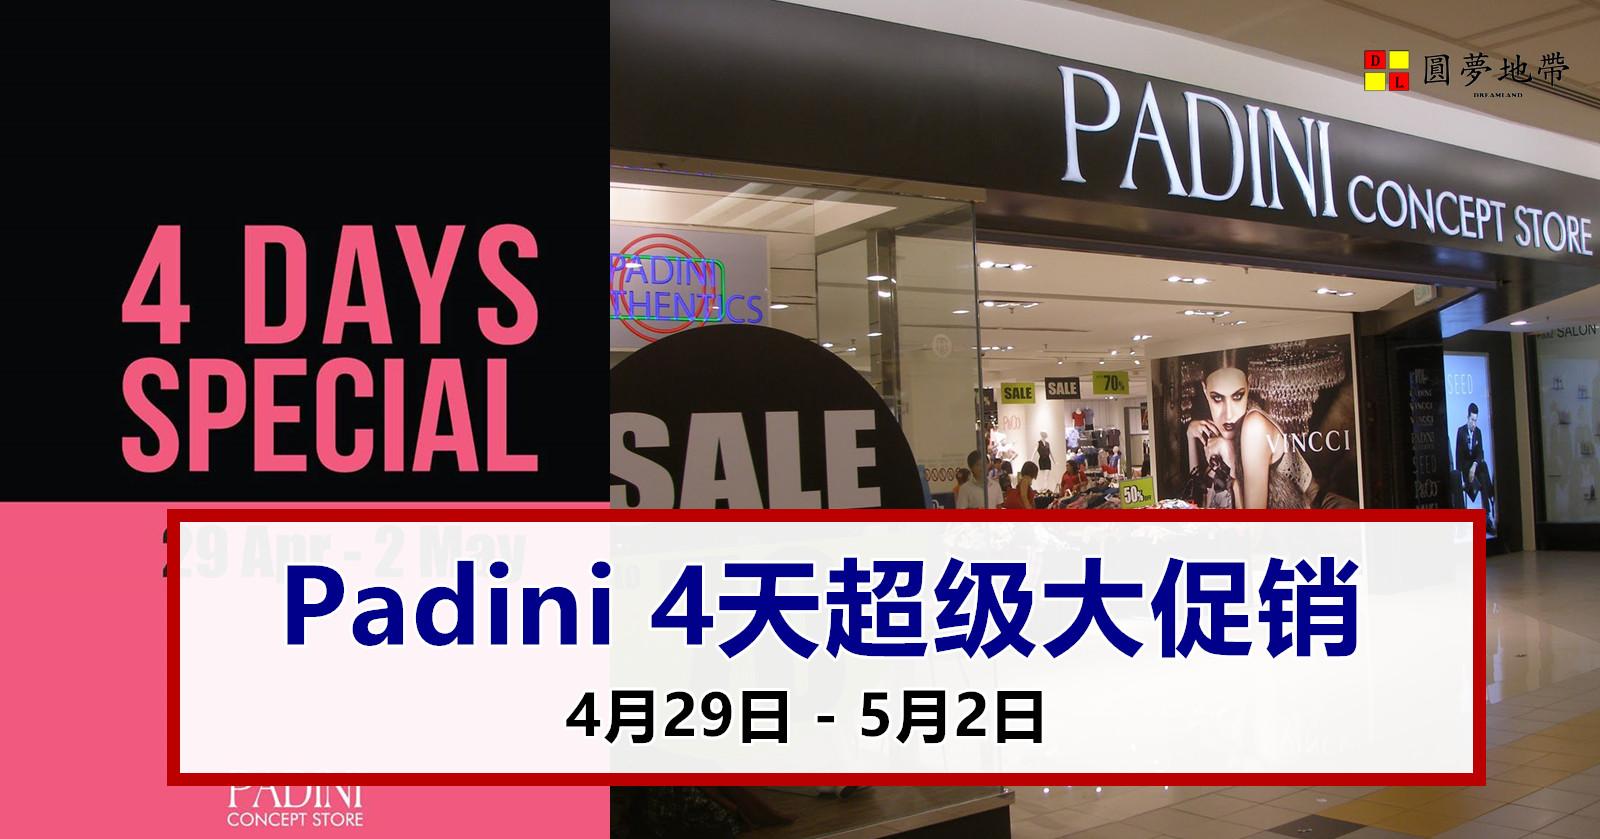 leadership of padini concept store Padini holdings brands including padini, seed, padini authentics, p&co, pdi, miki, vincci, vincci accessories, tizio & brands outlet.